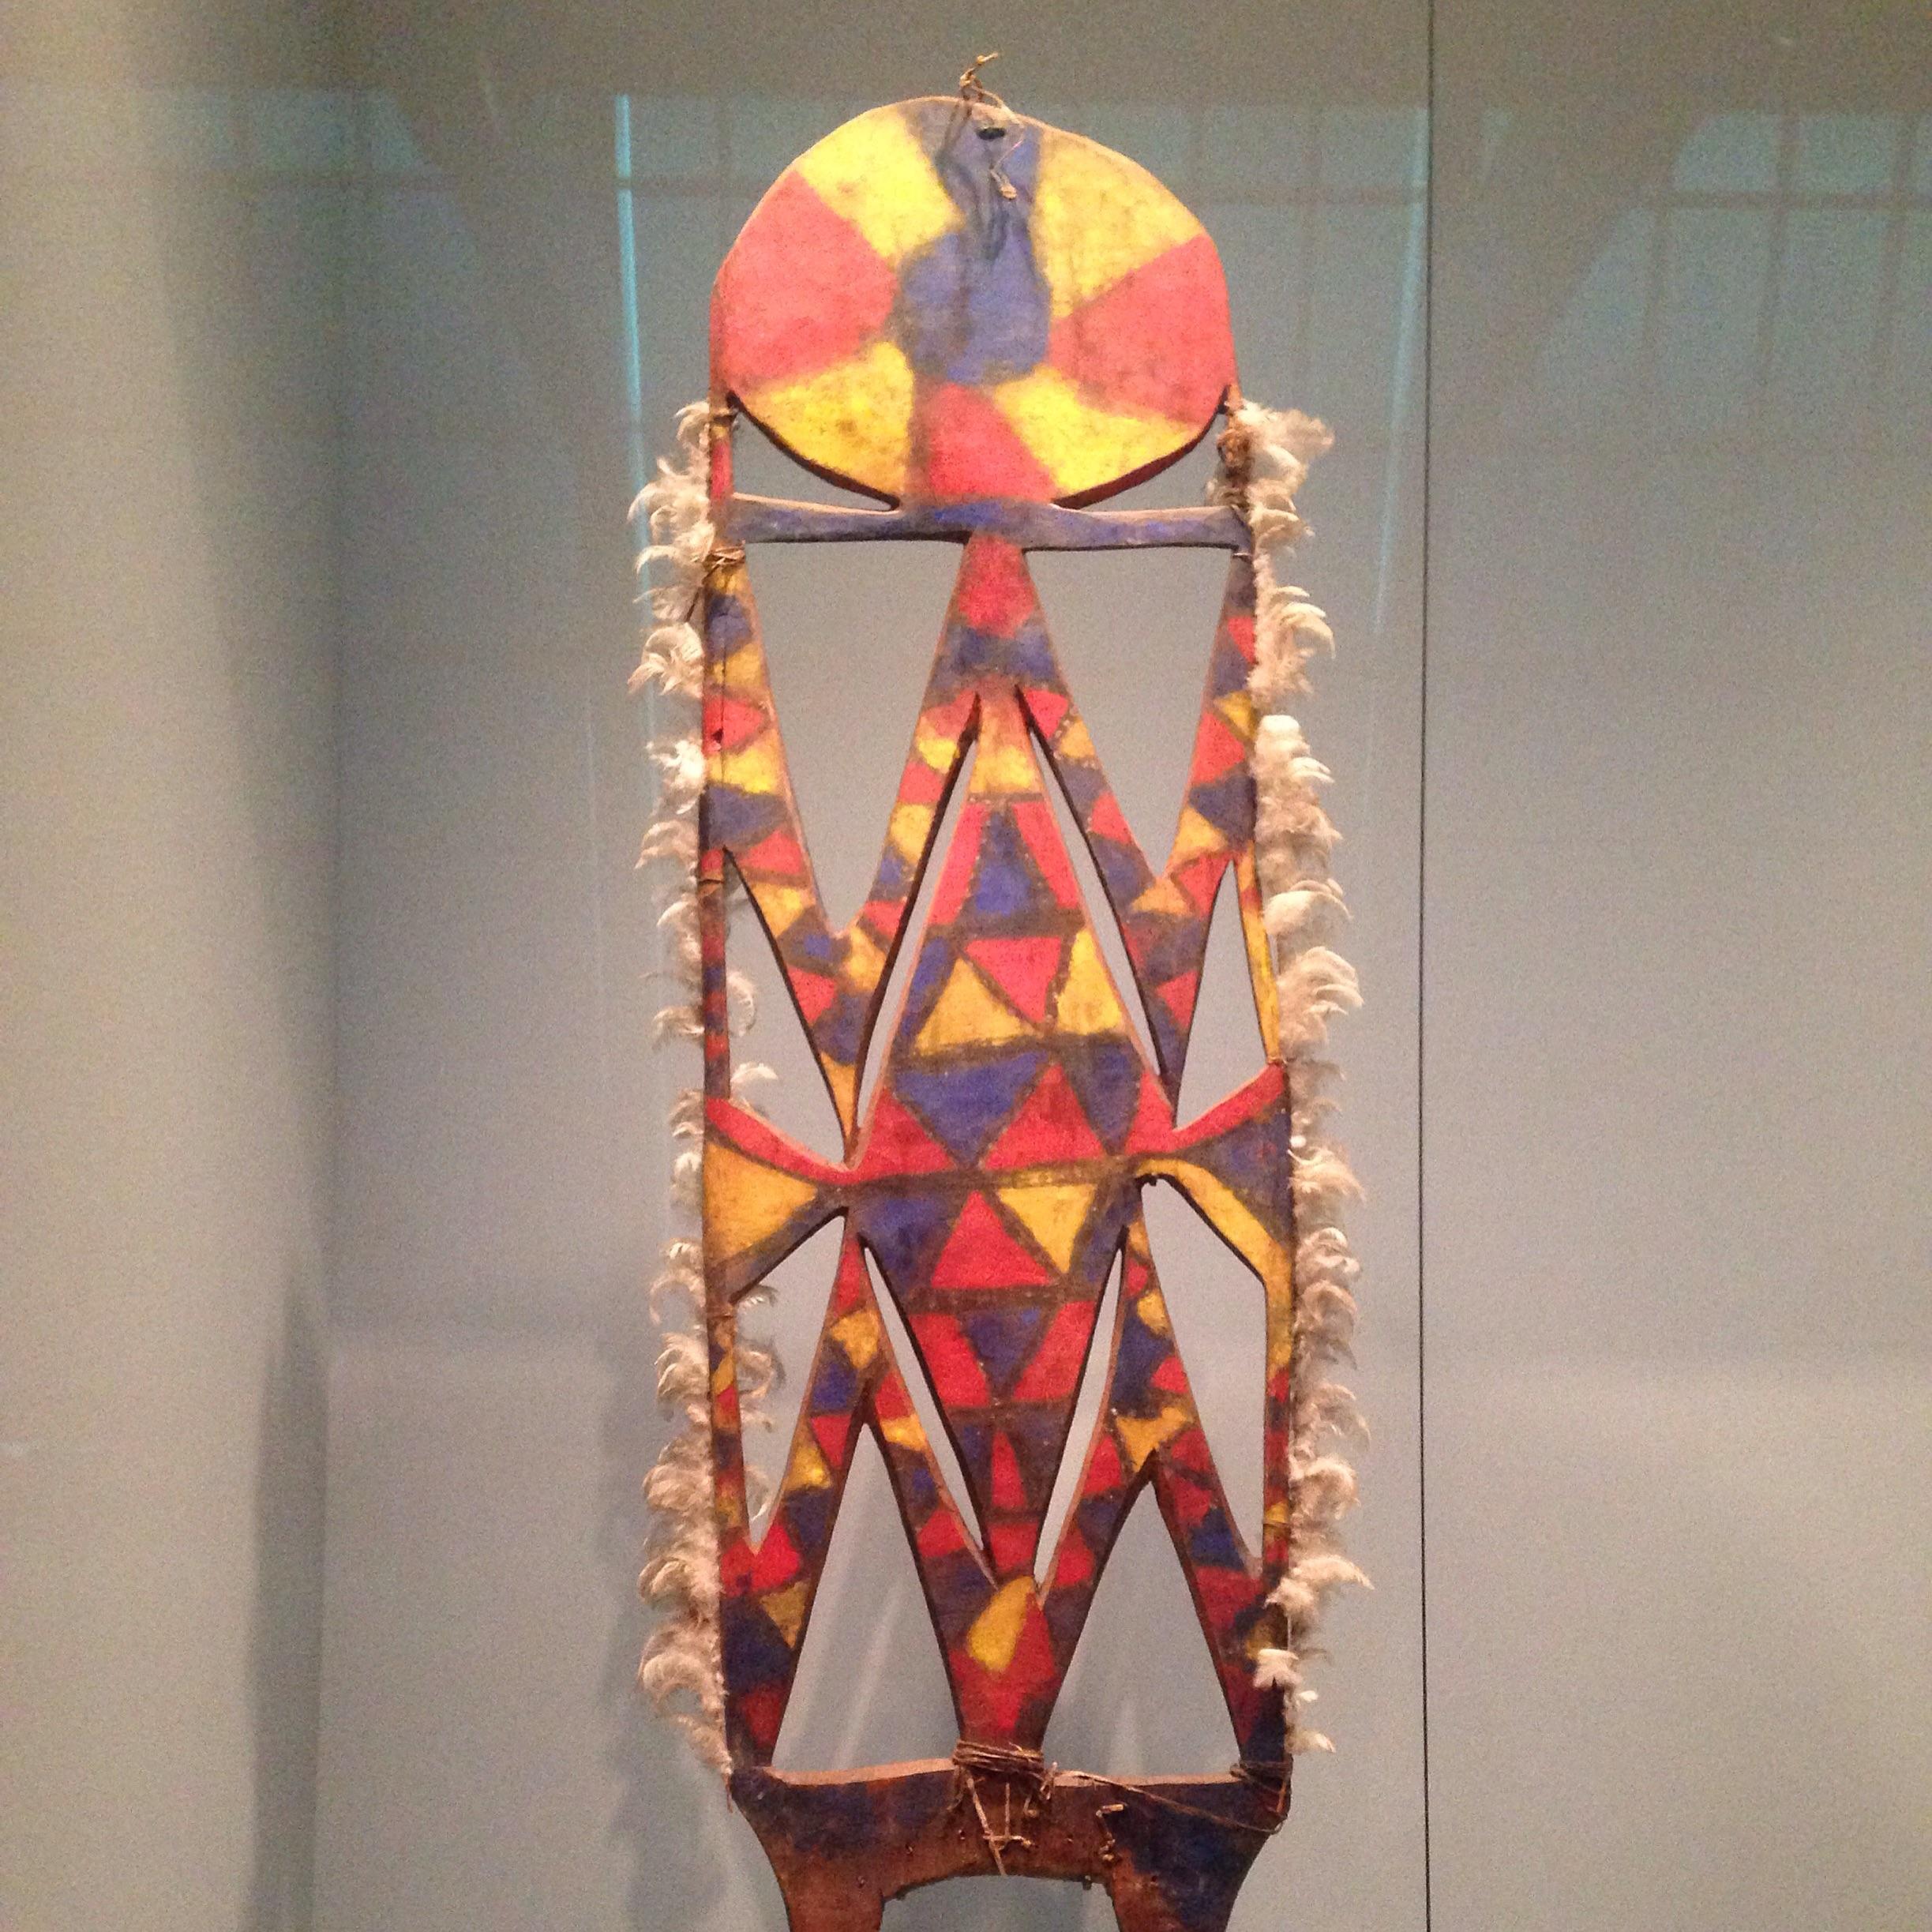 Sculpture from the Metropolitam Museum of Art